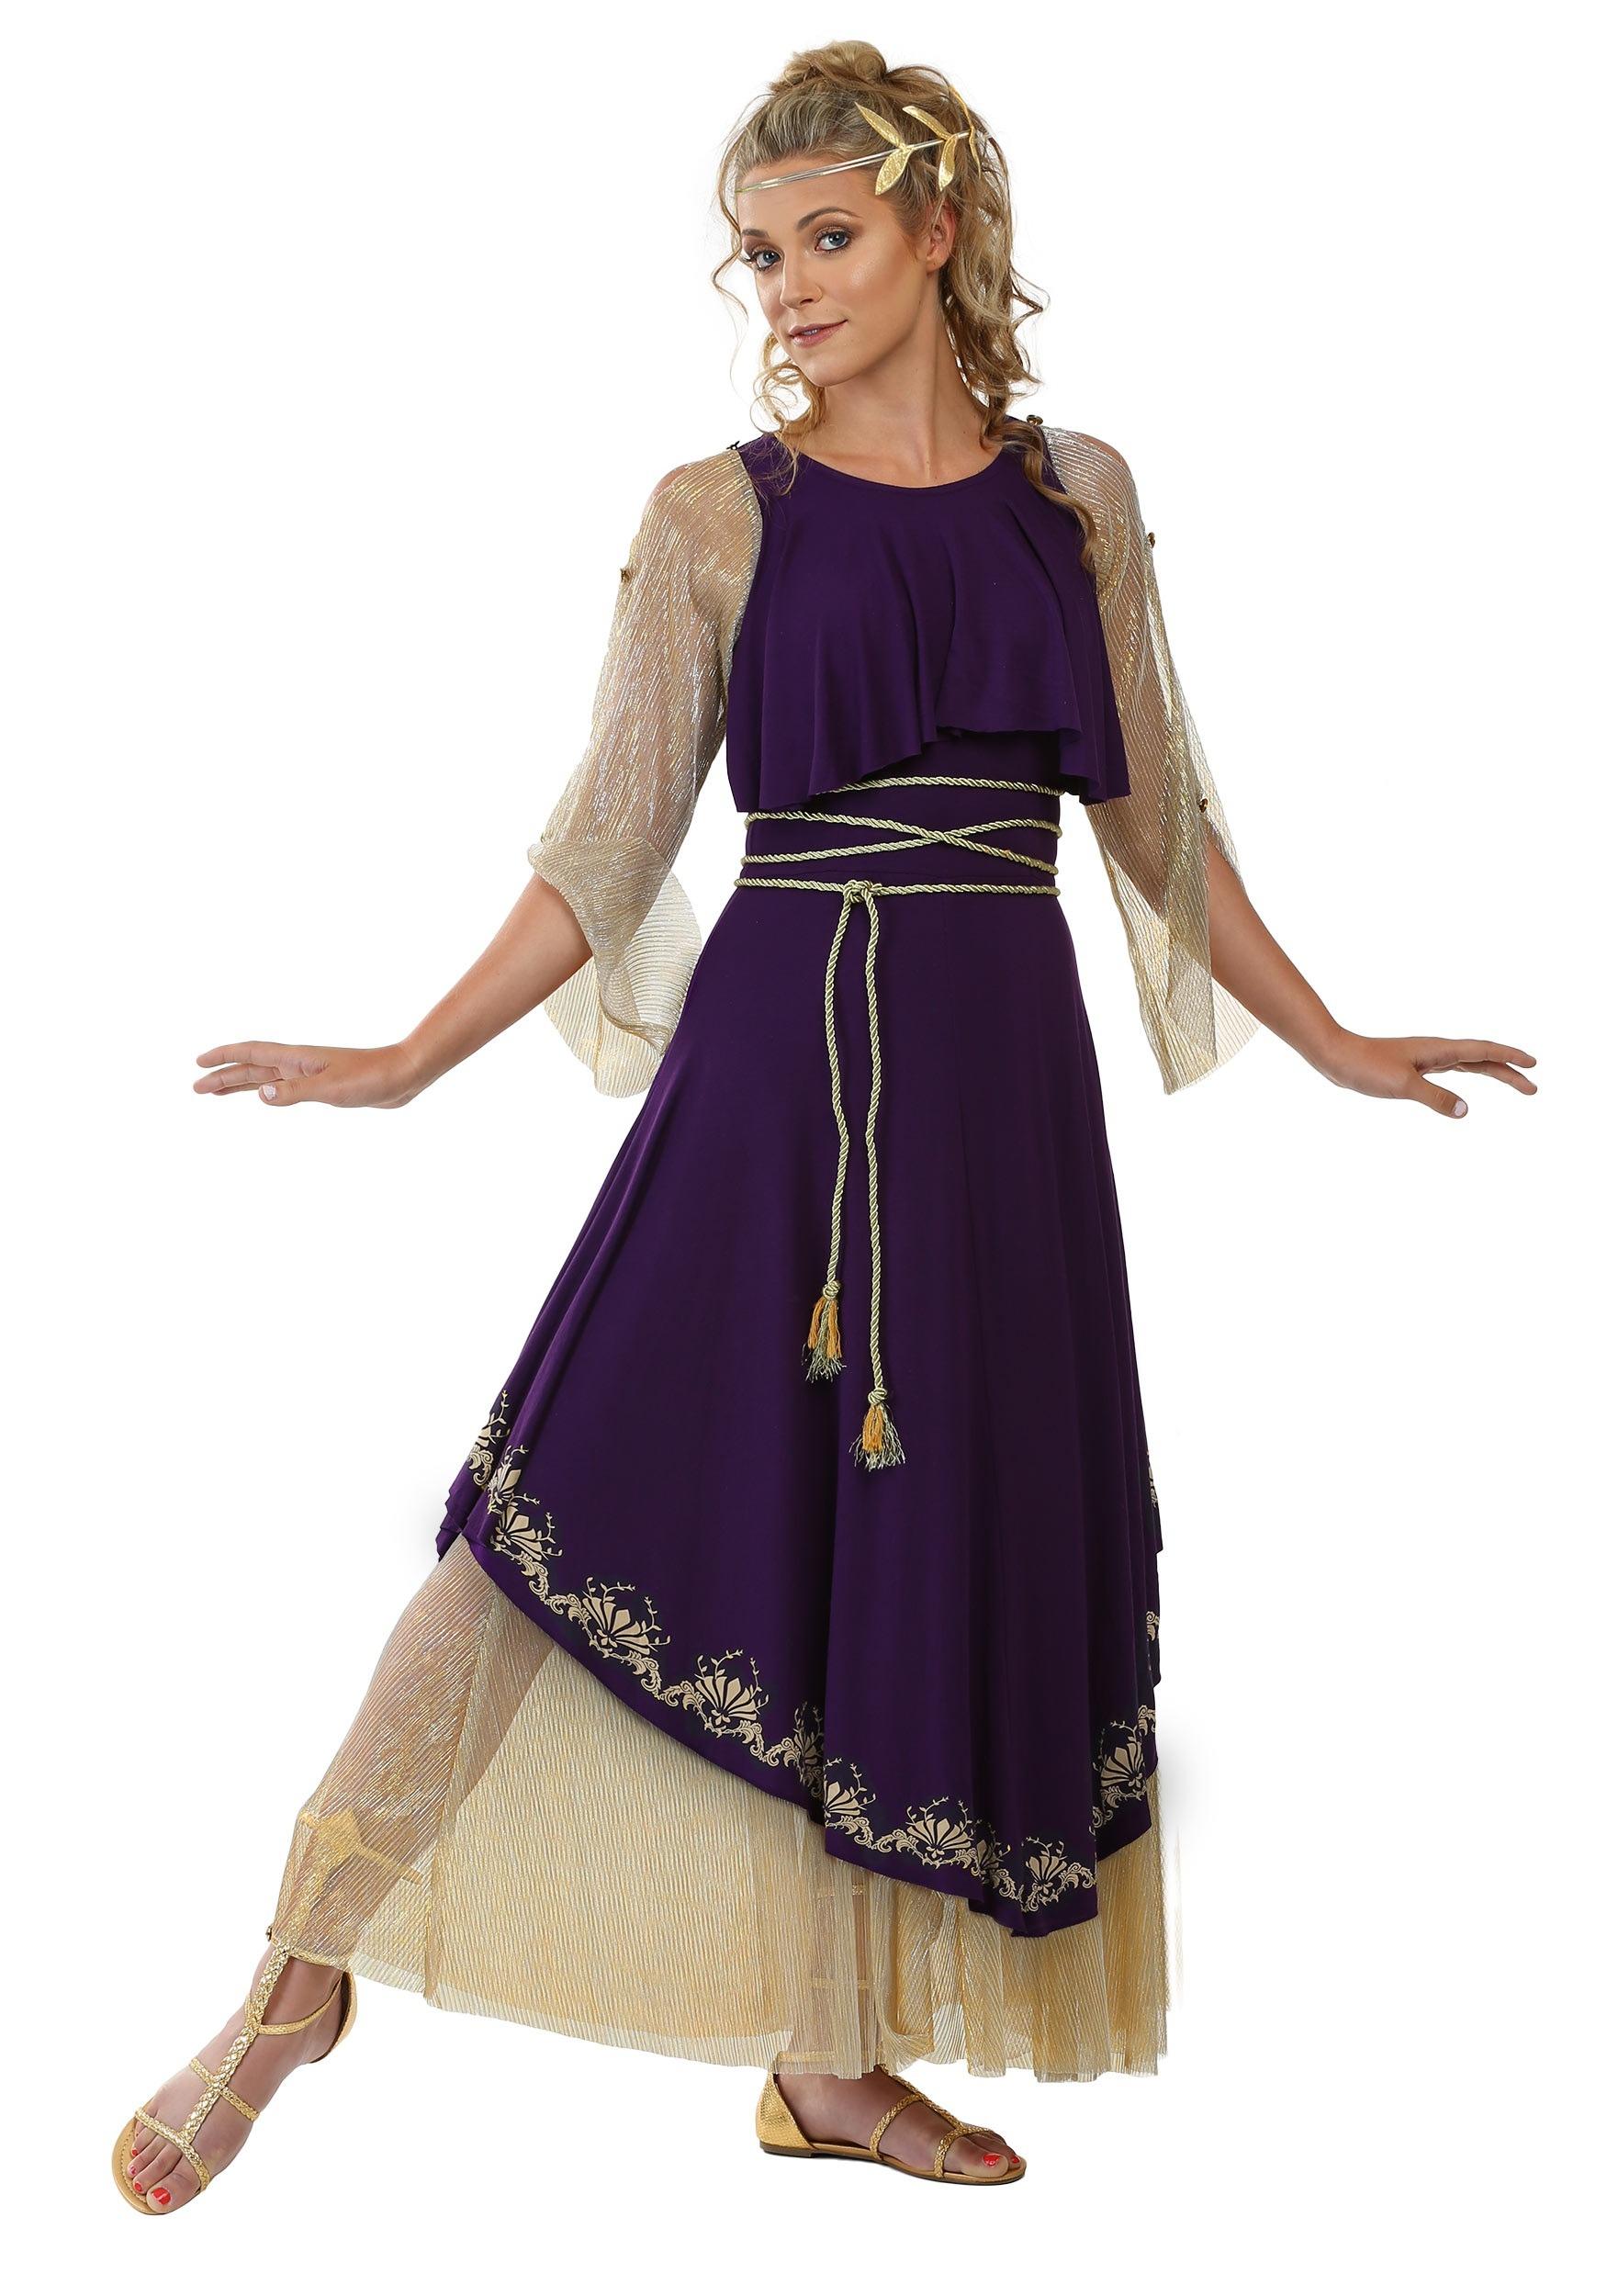 Aphrodite Goddess Plus Size Women\'s Costume